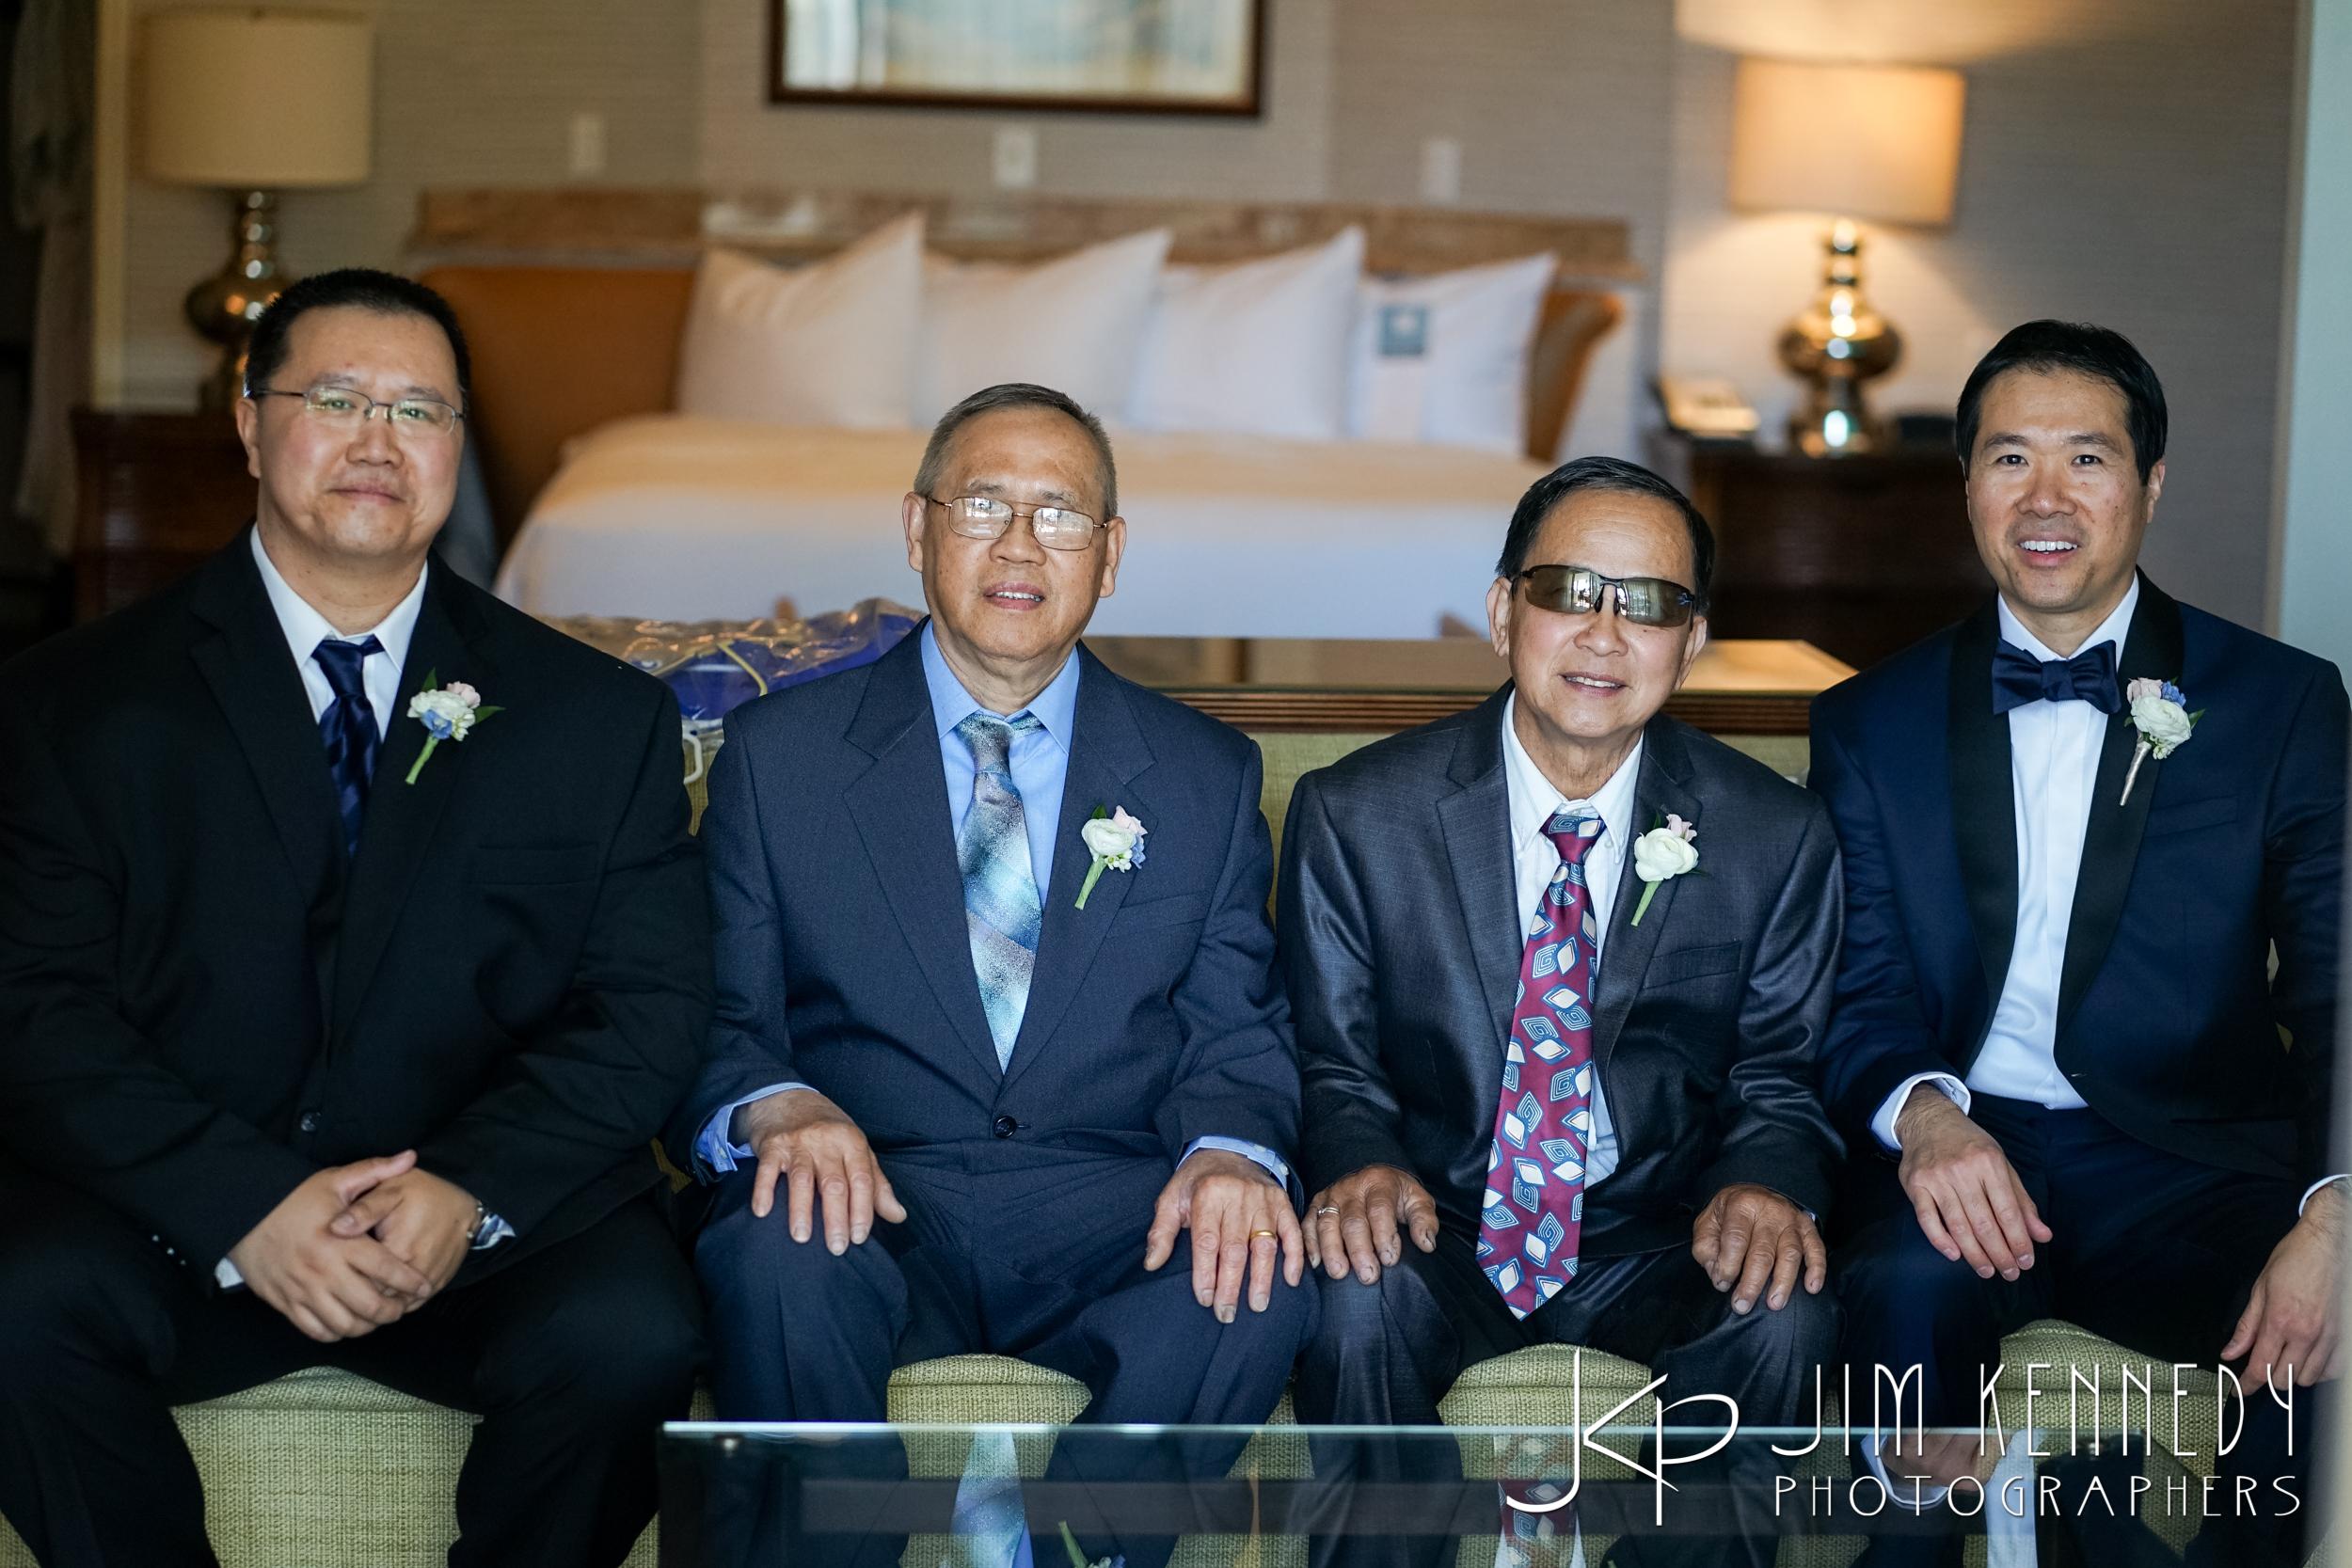 hyatt_huntington_beach_wedding-0925.jpg